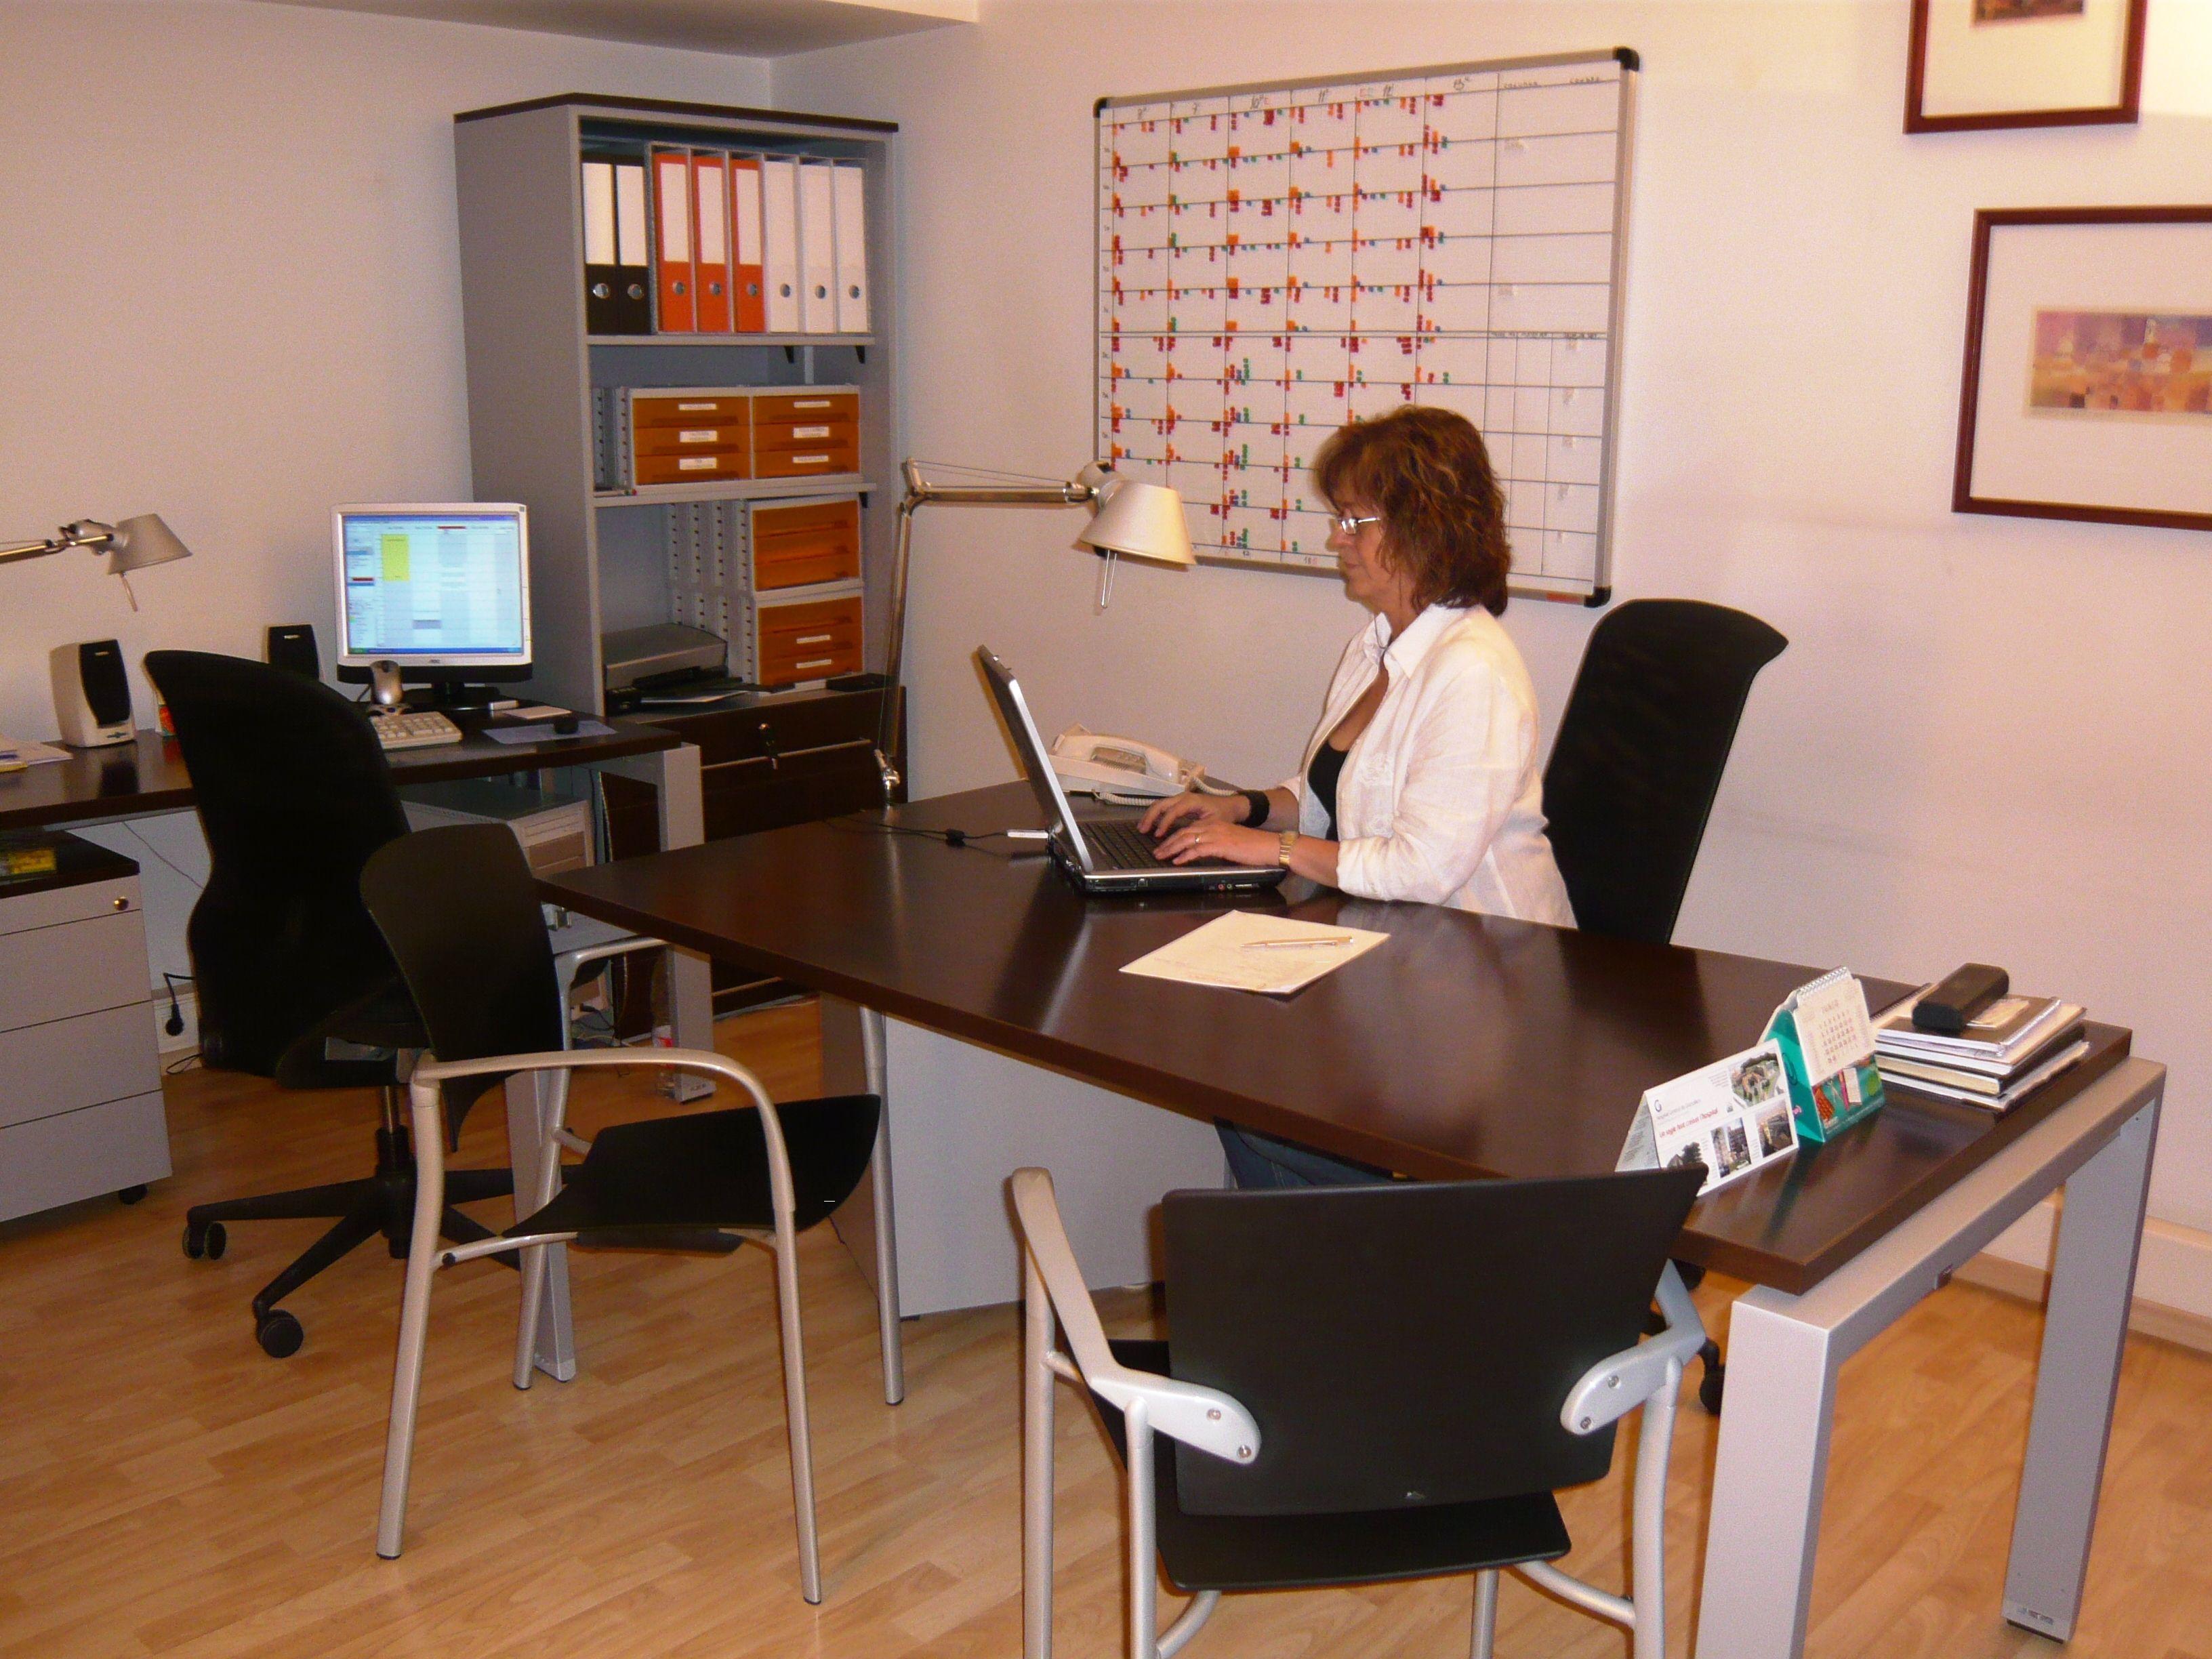 Foto 21 de Fisioterapia en  | Centro de Recuperación Funcional Vallés Mercè Ventura